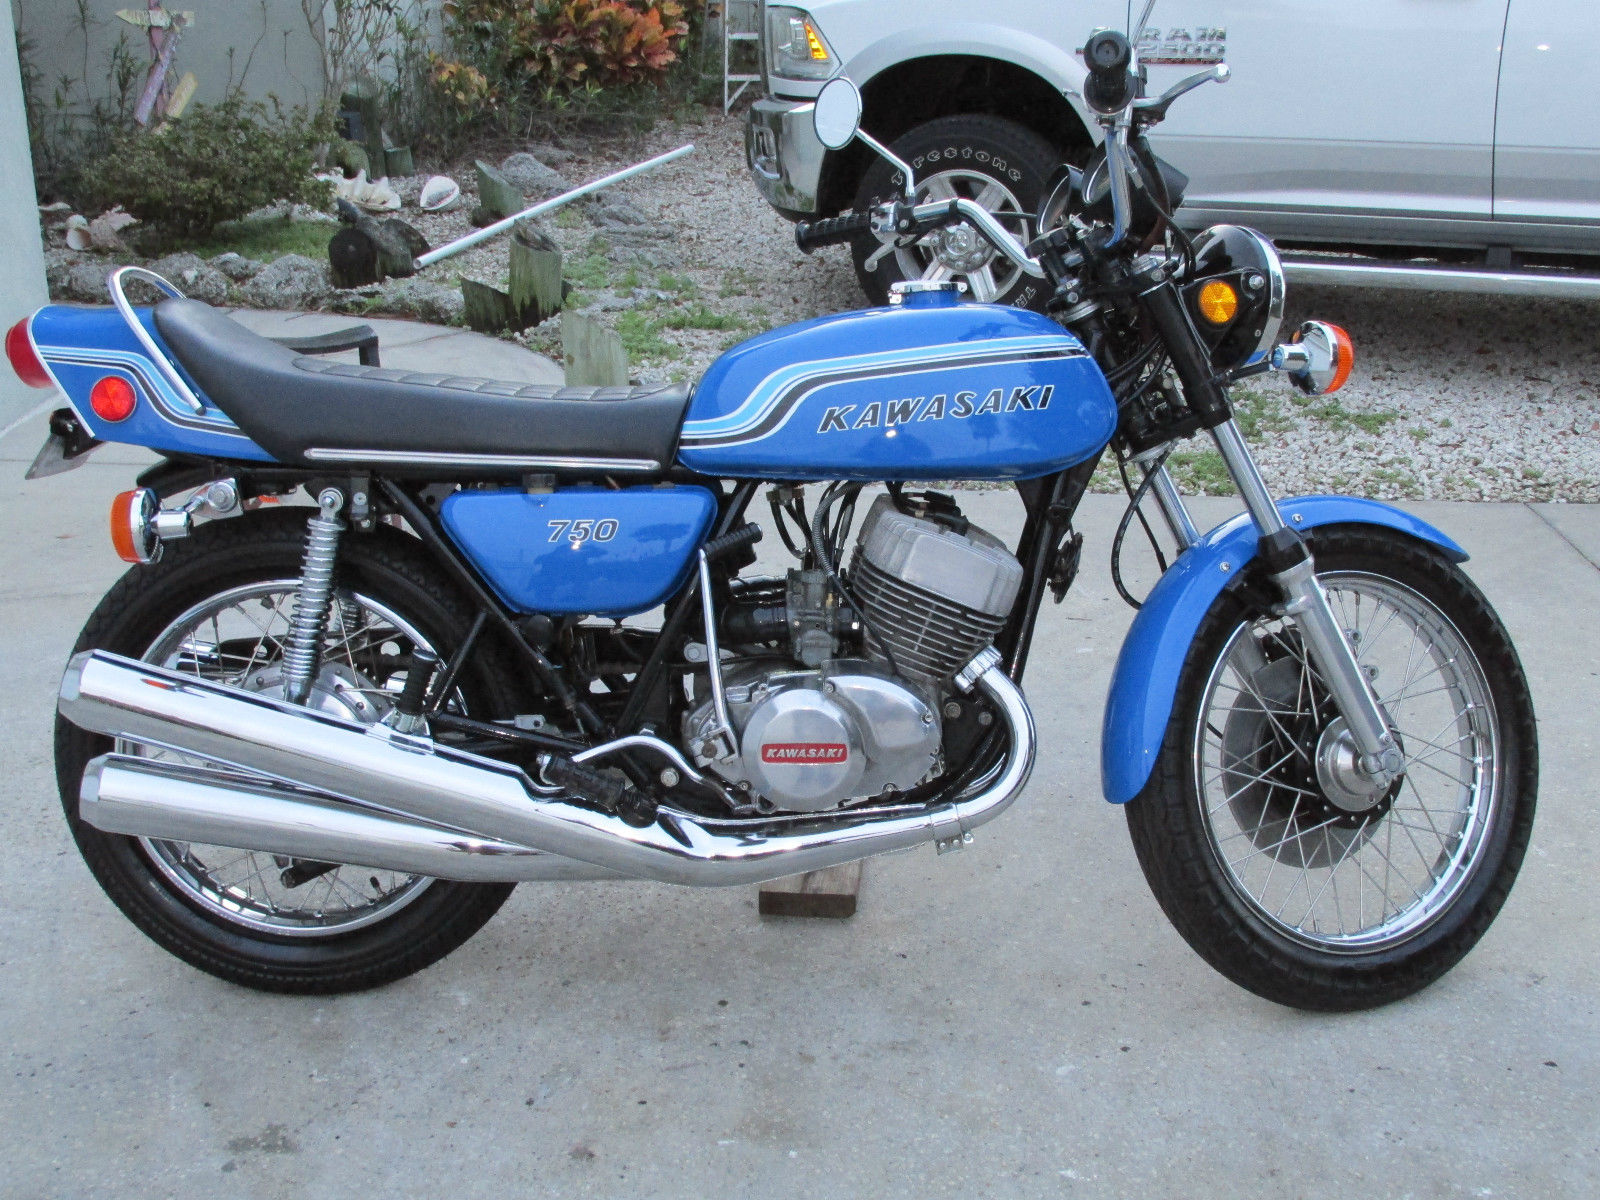 Kawasaki H2 - 1972 - Motor and Transmission, Exhausts, Tank and Side Panels.